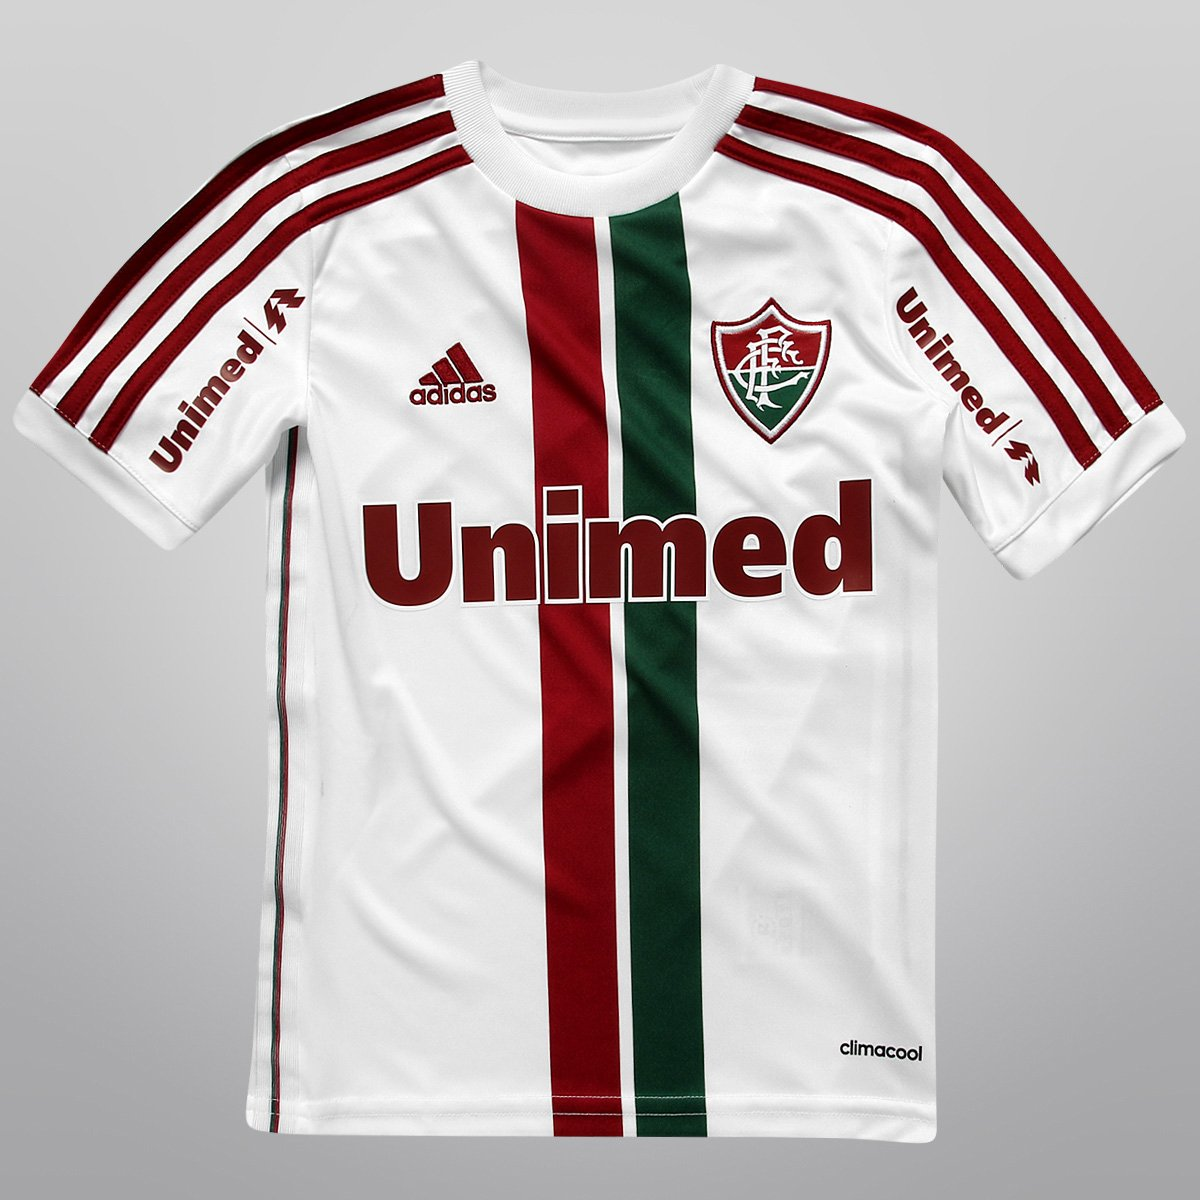 f45245650b Camisa Adidas Fluminense II 14 15 s nº Infantil - Compre Agora ...